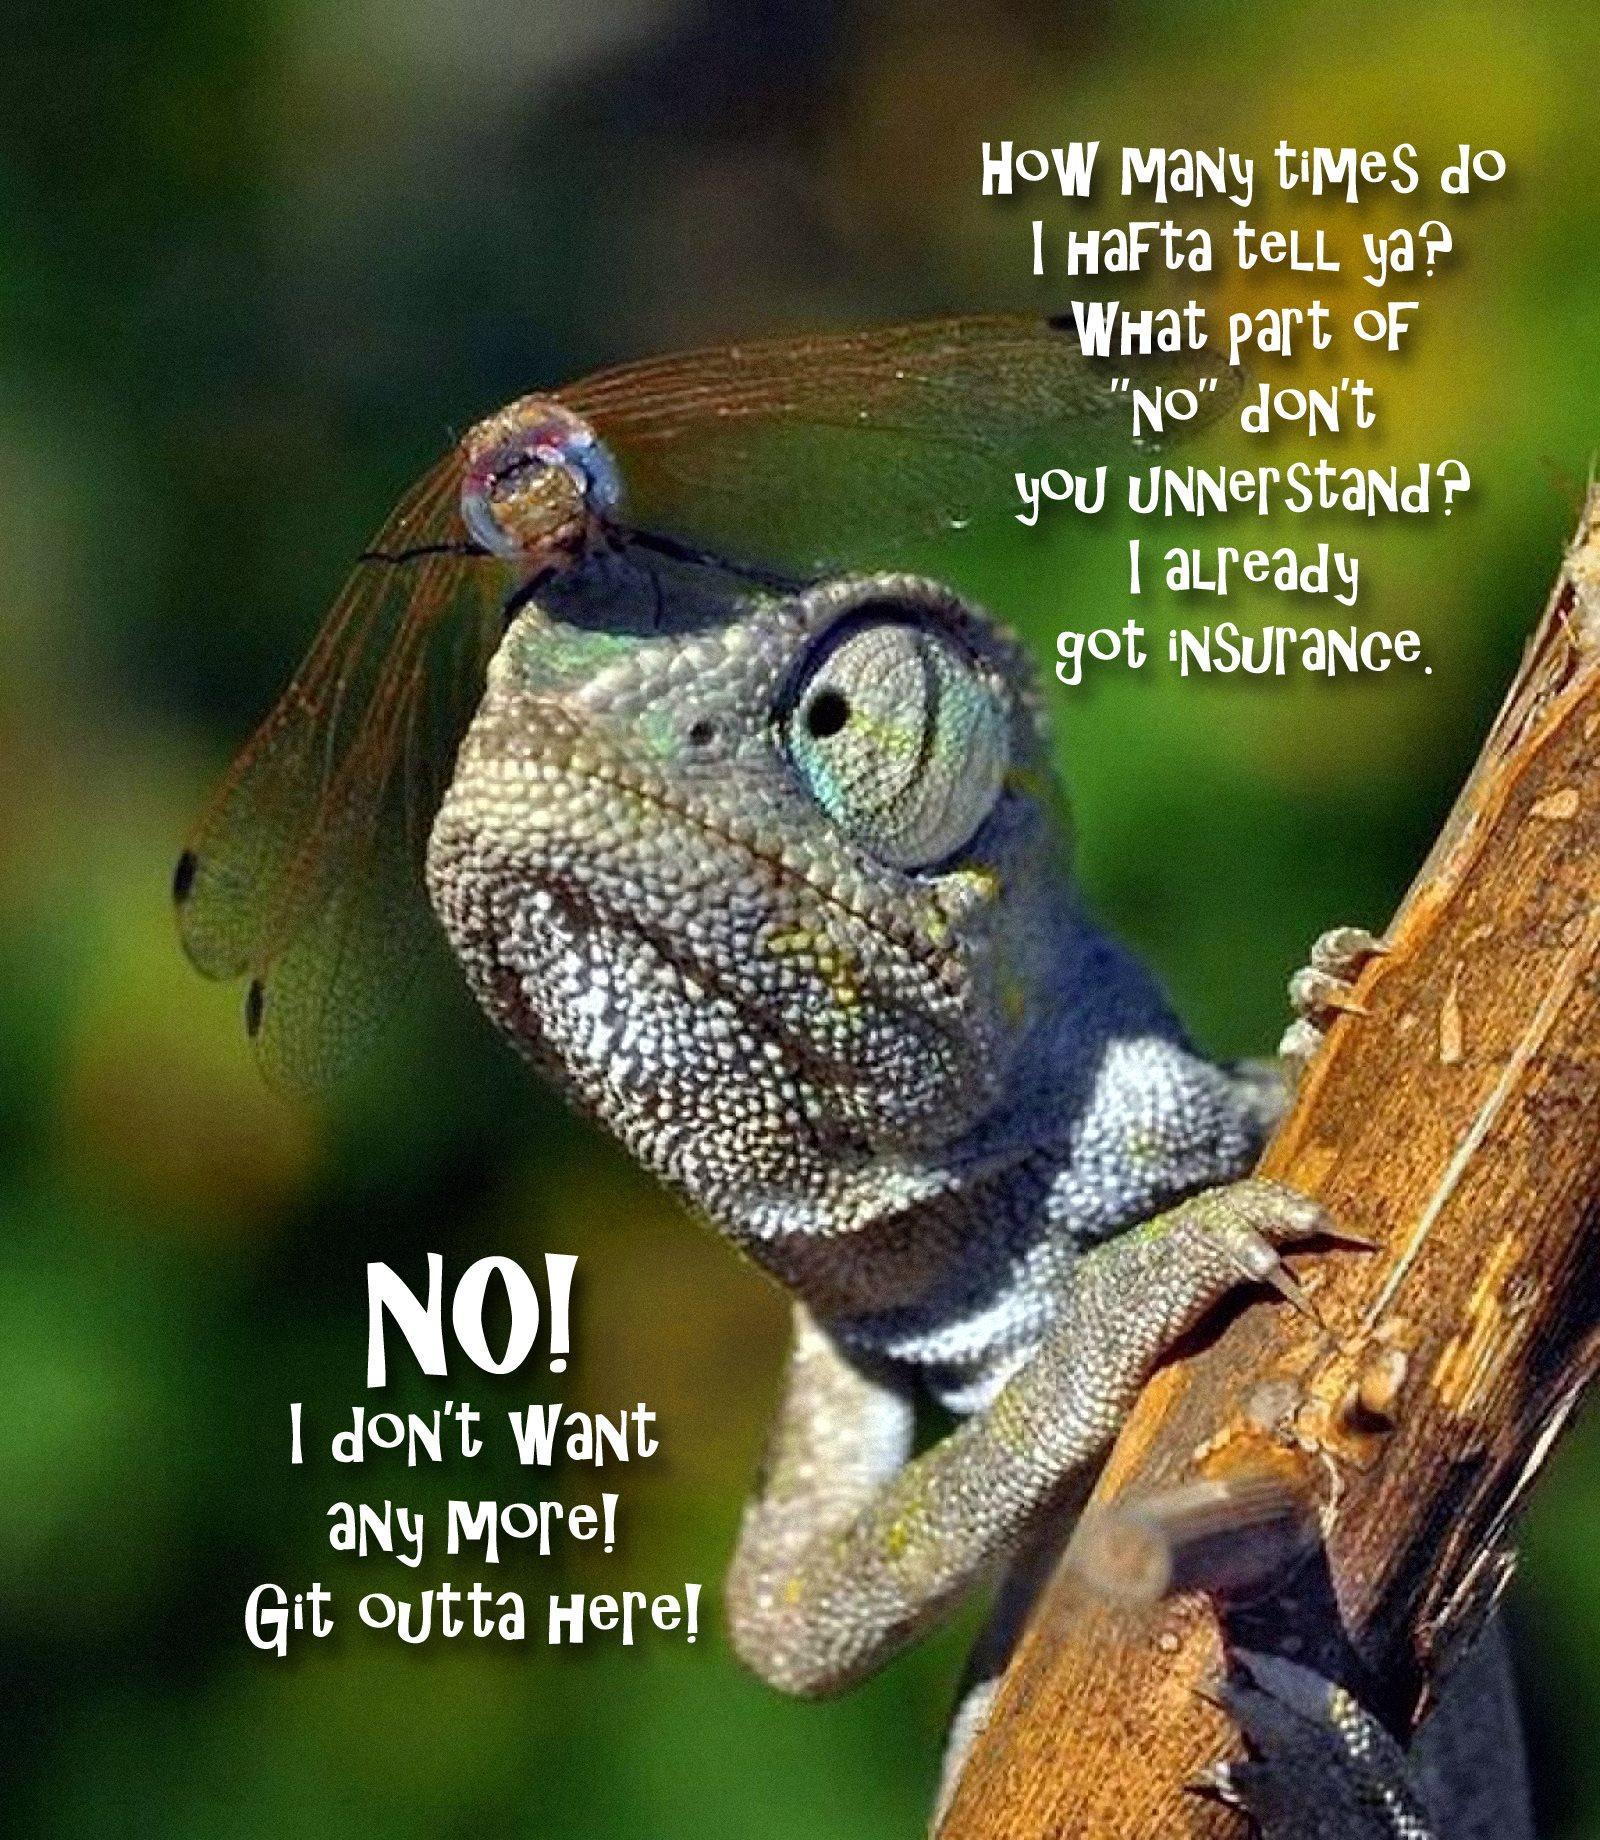 00 animal funnies. no! I don't want any! 070815